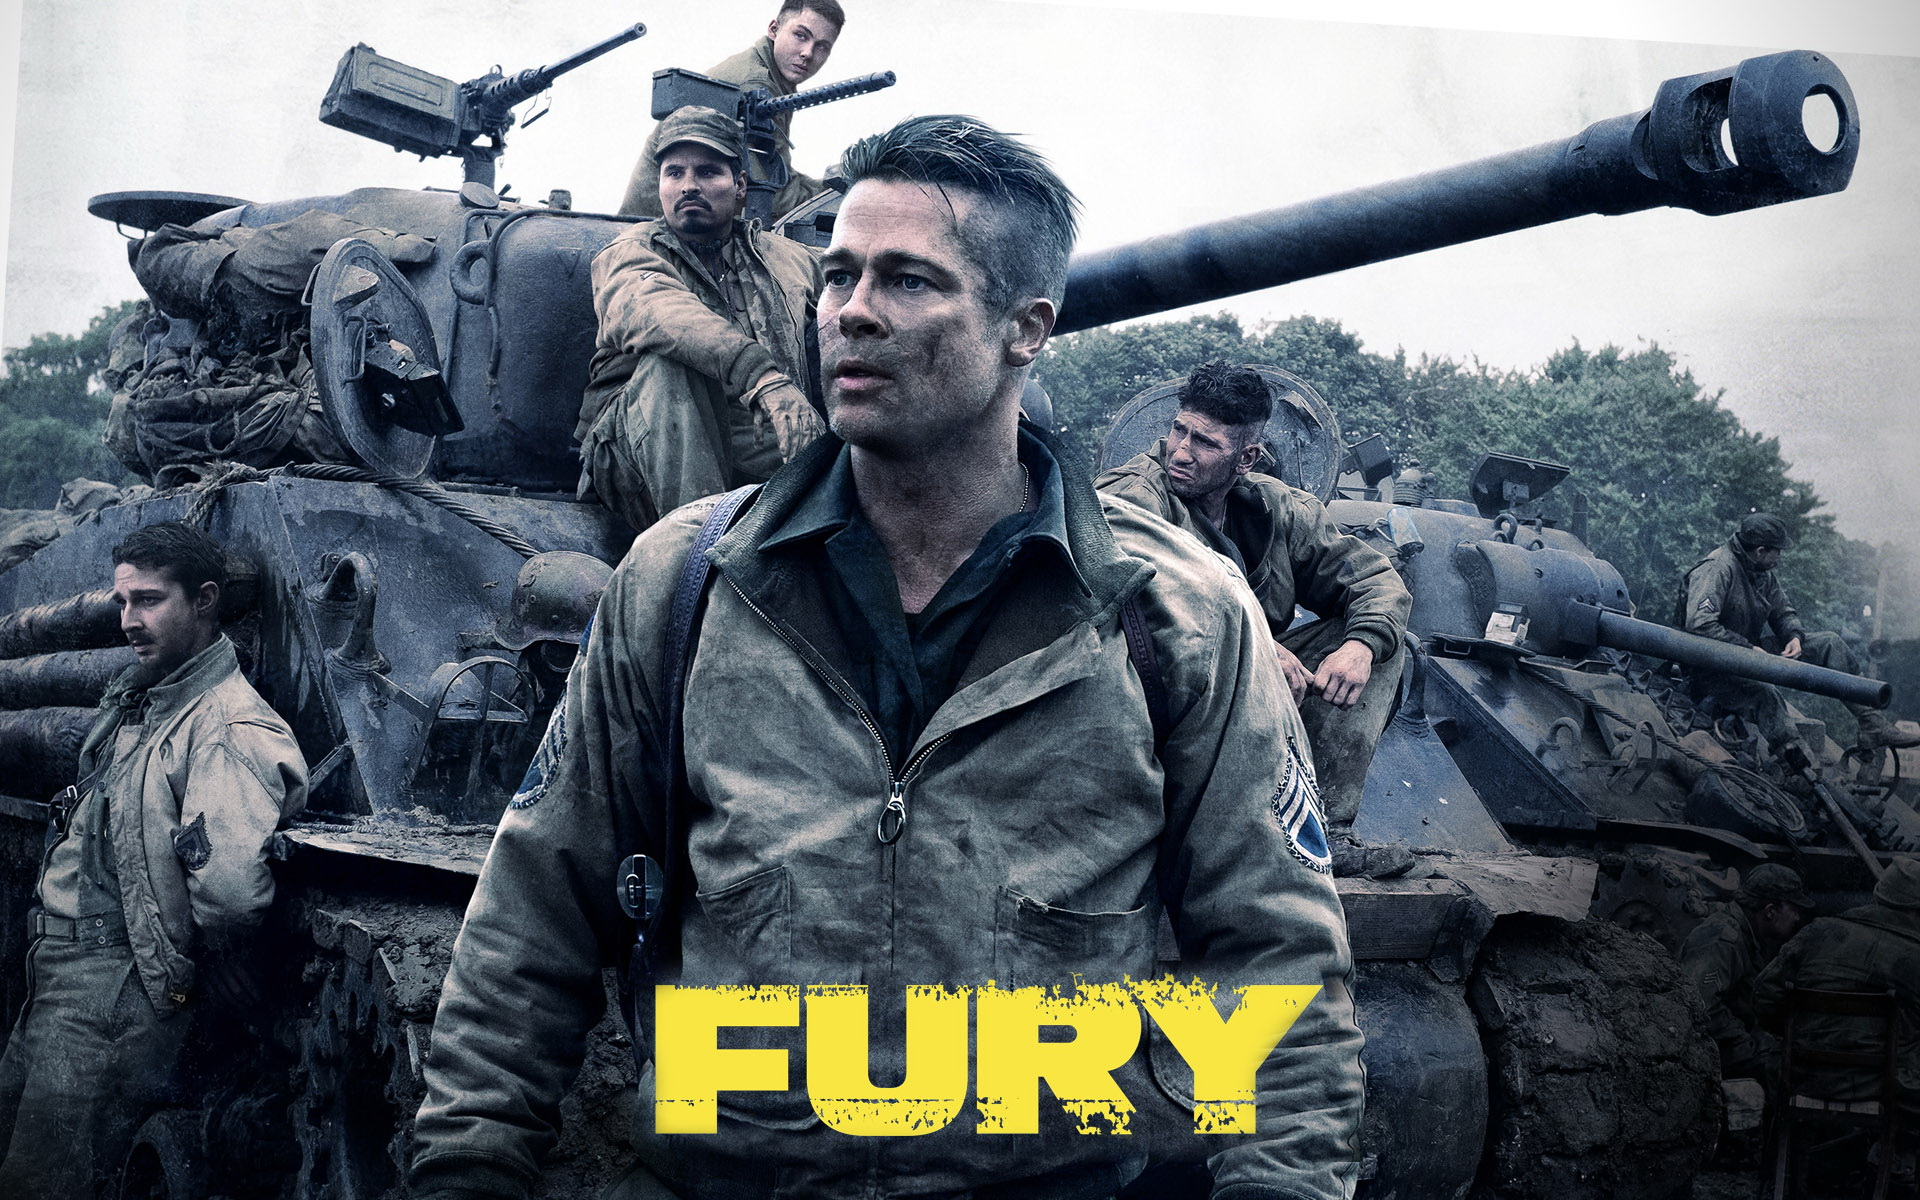 Fury Movie 2014 Wallpaper fury movie 2014 brad pitt 1920x1200